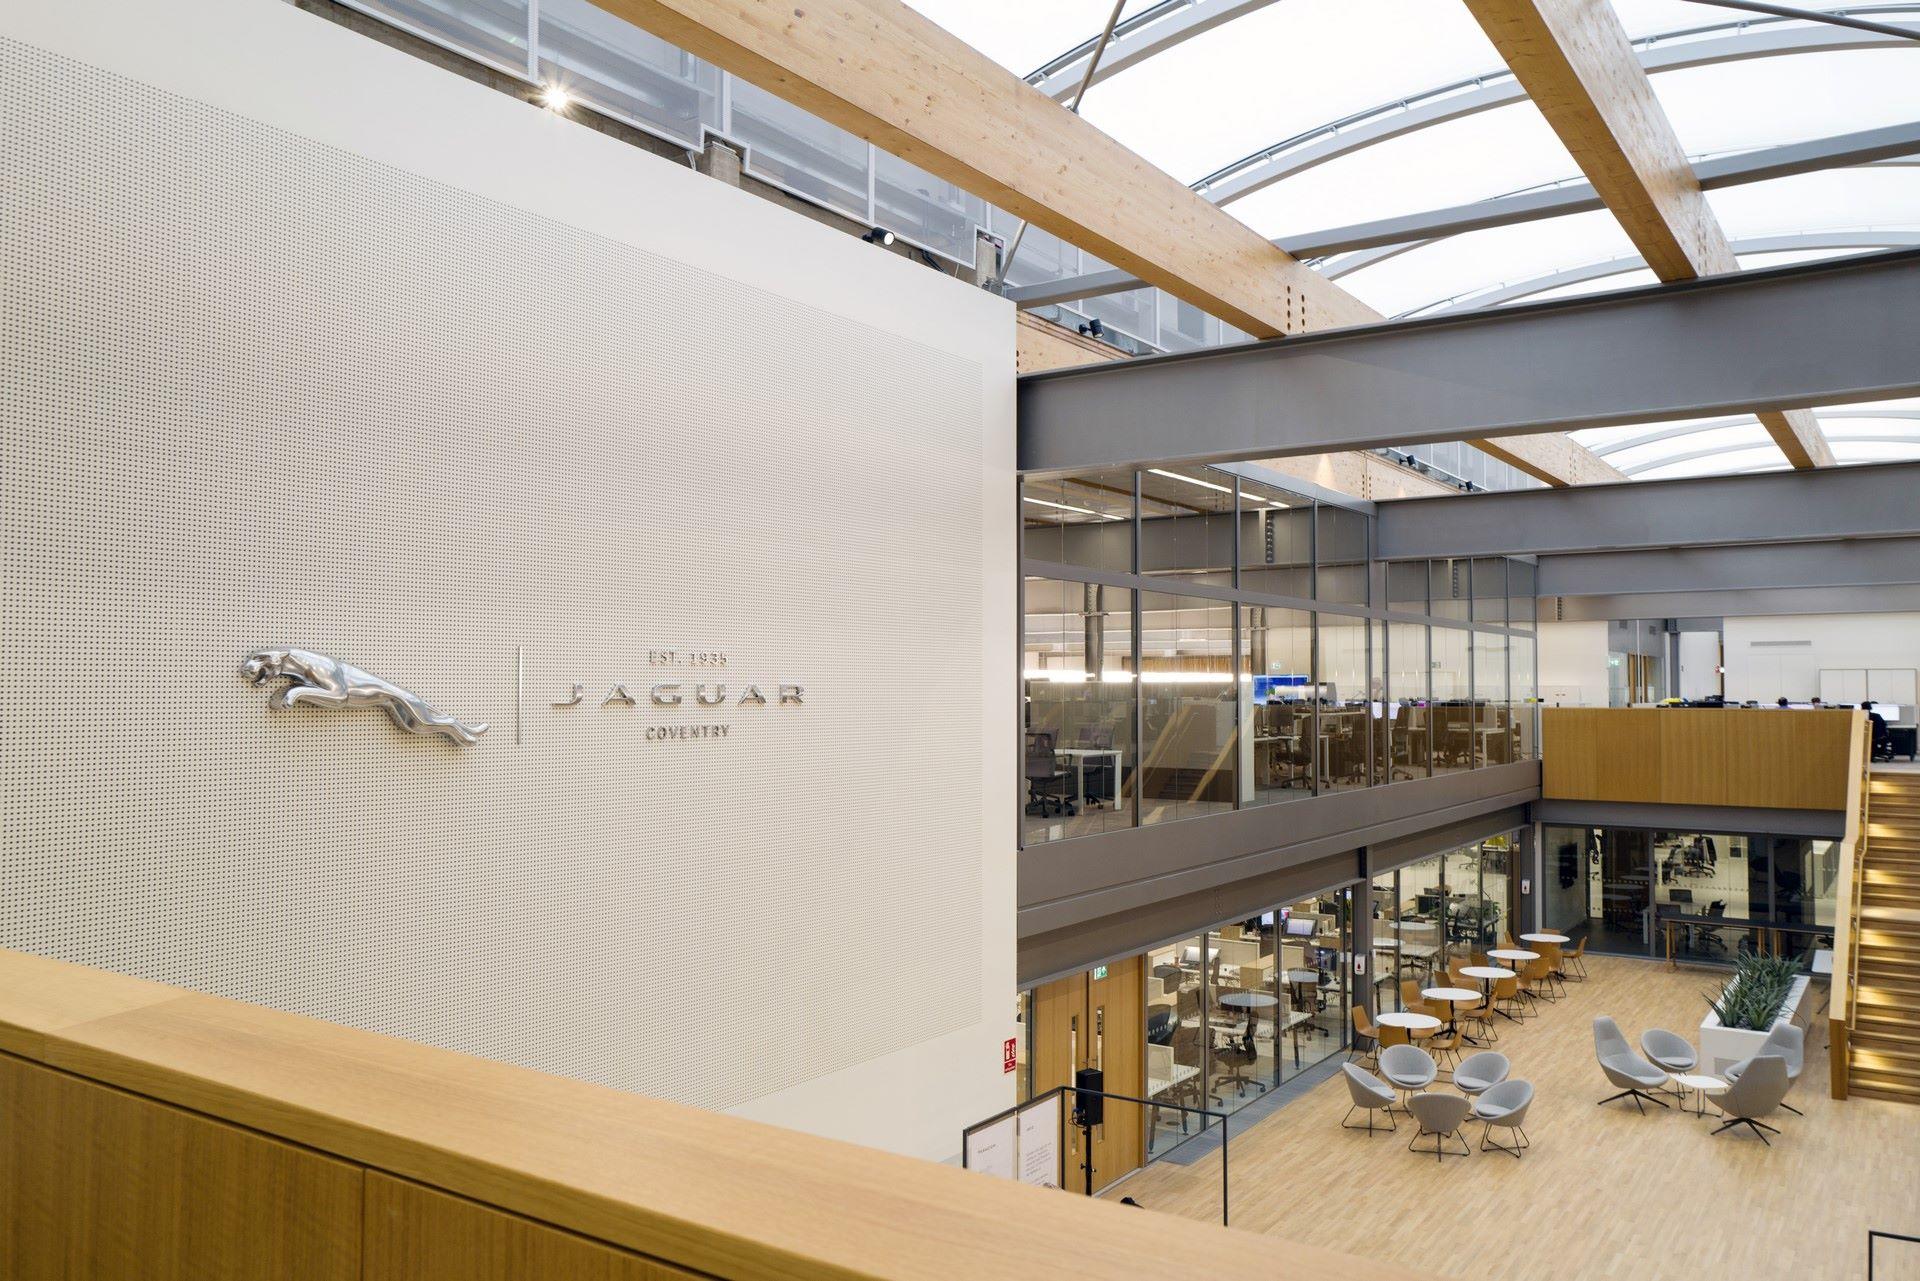 Jag_Design_Studio_L1040233_260919